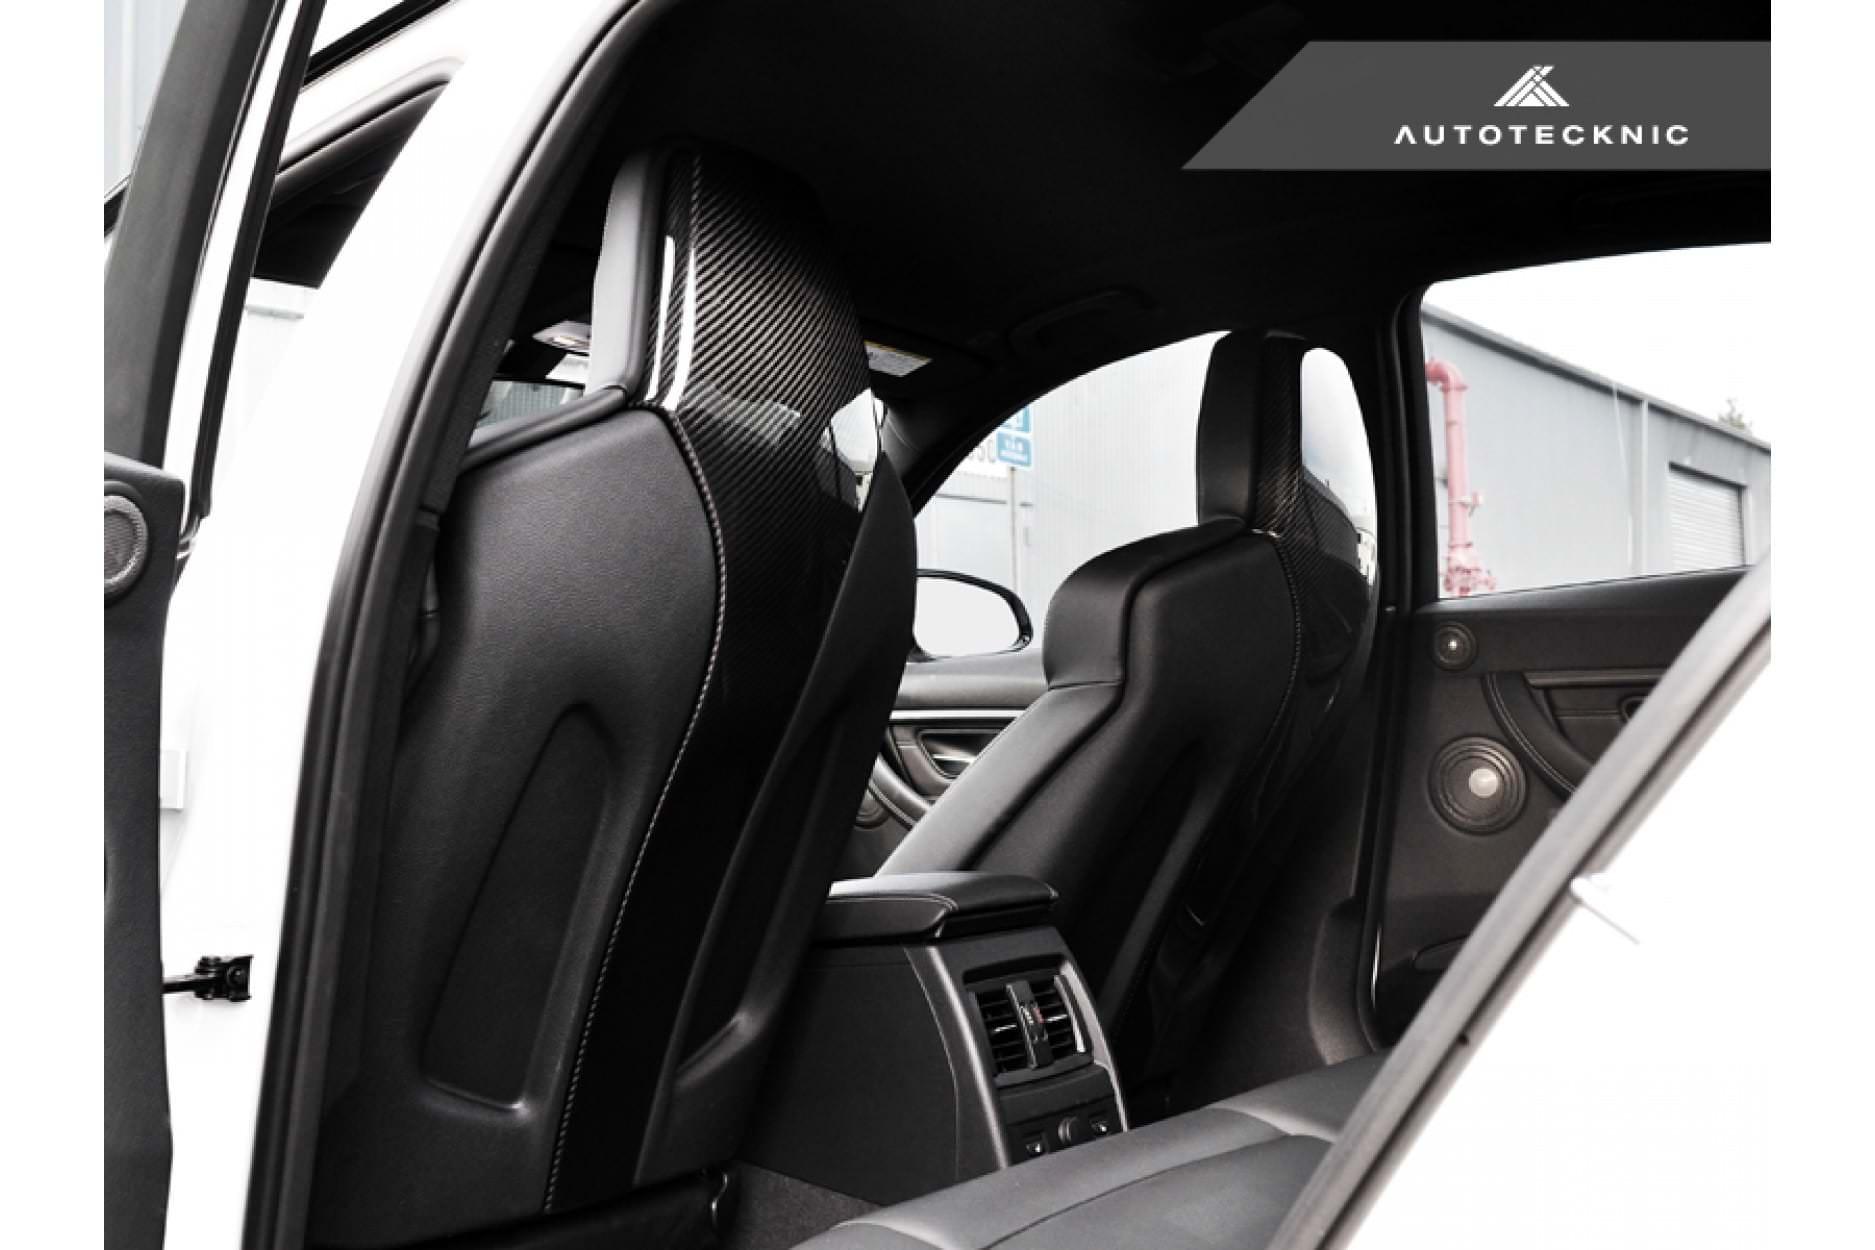 Carbon Seat Cover Bmw M3 M4 F80 F82 F83 Ecd Cs M4